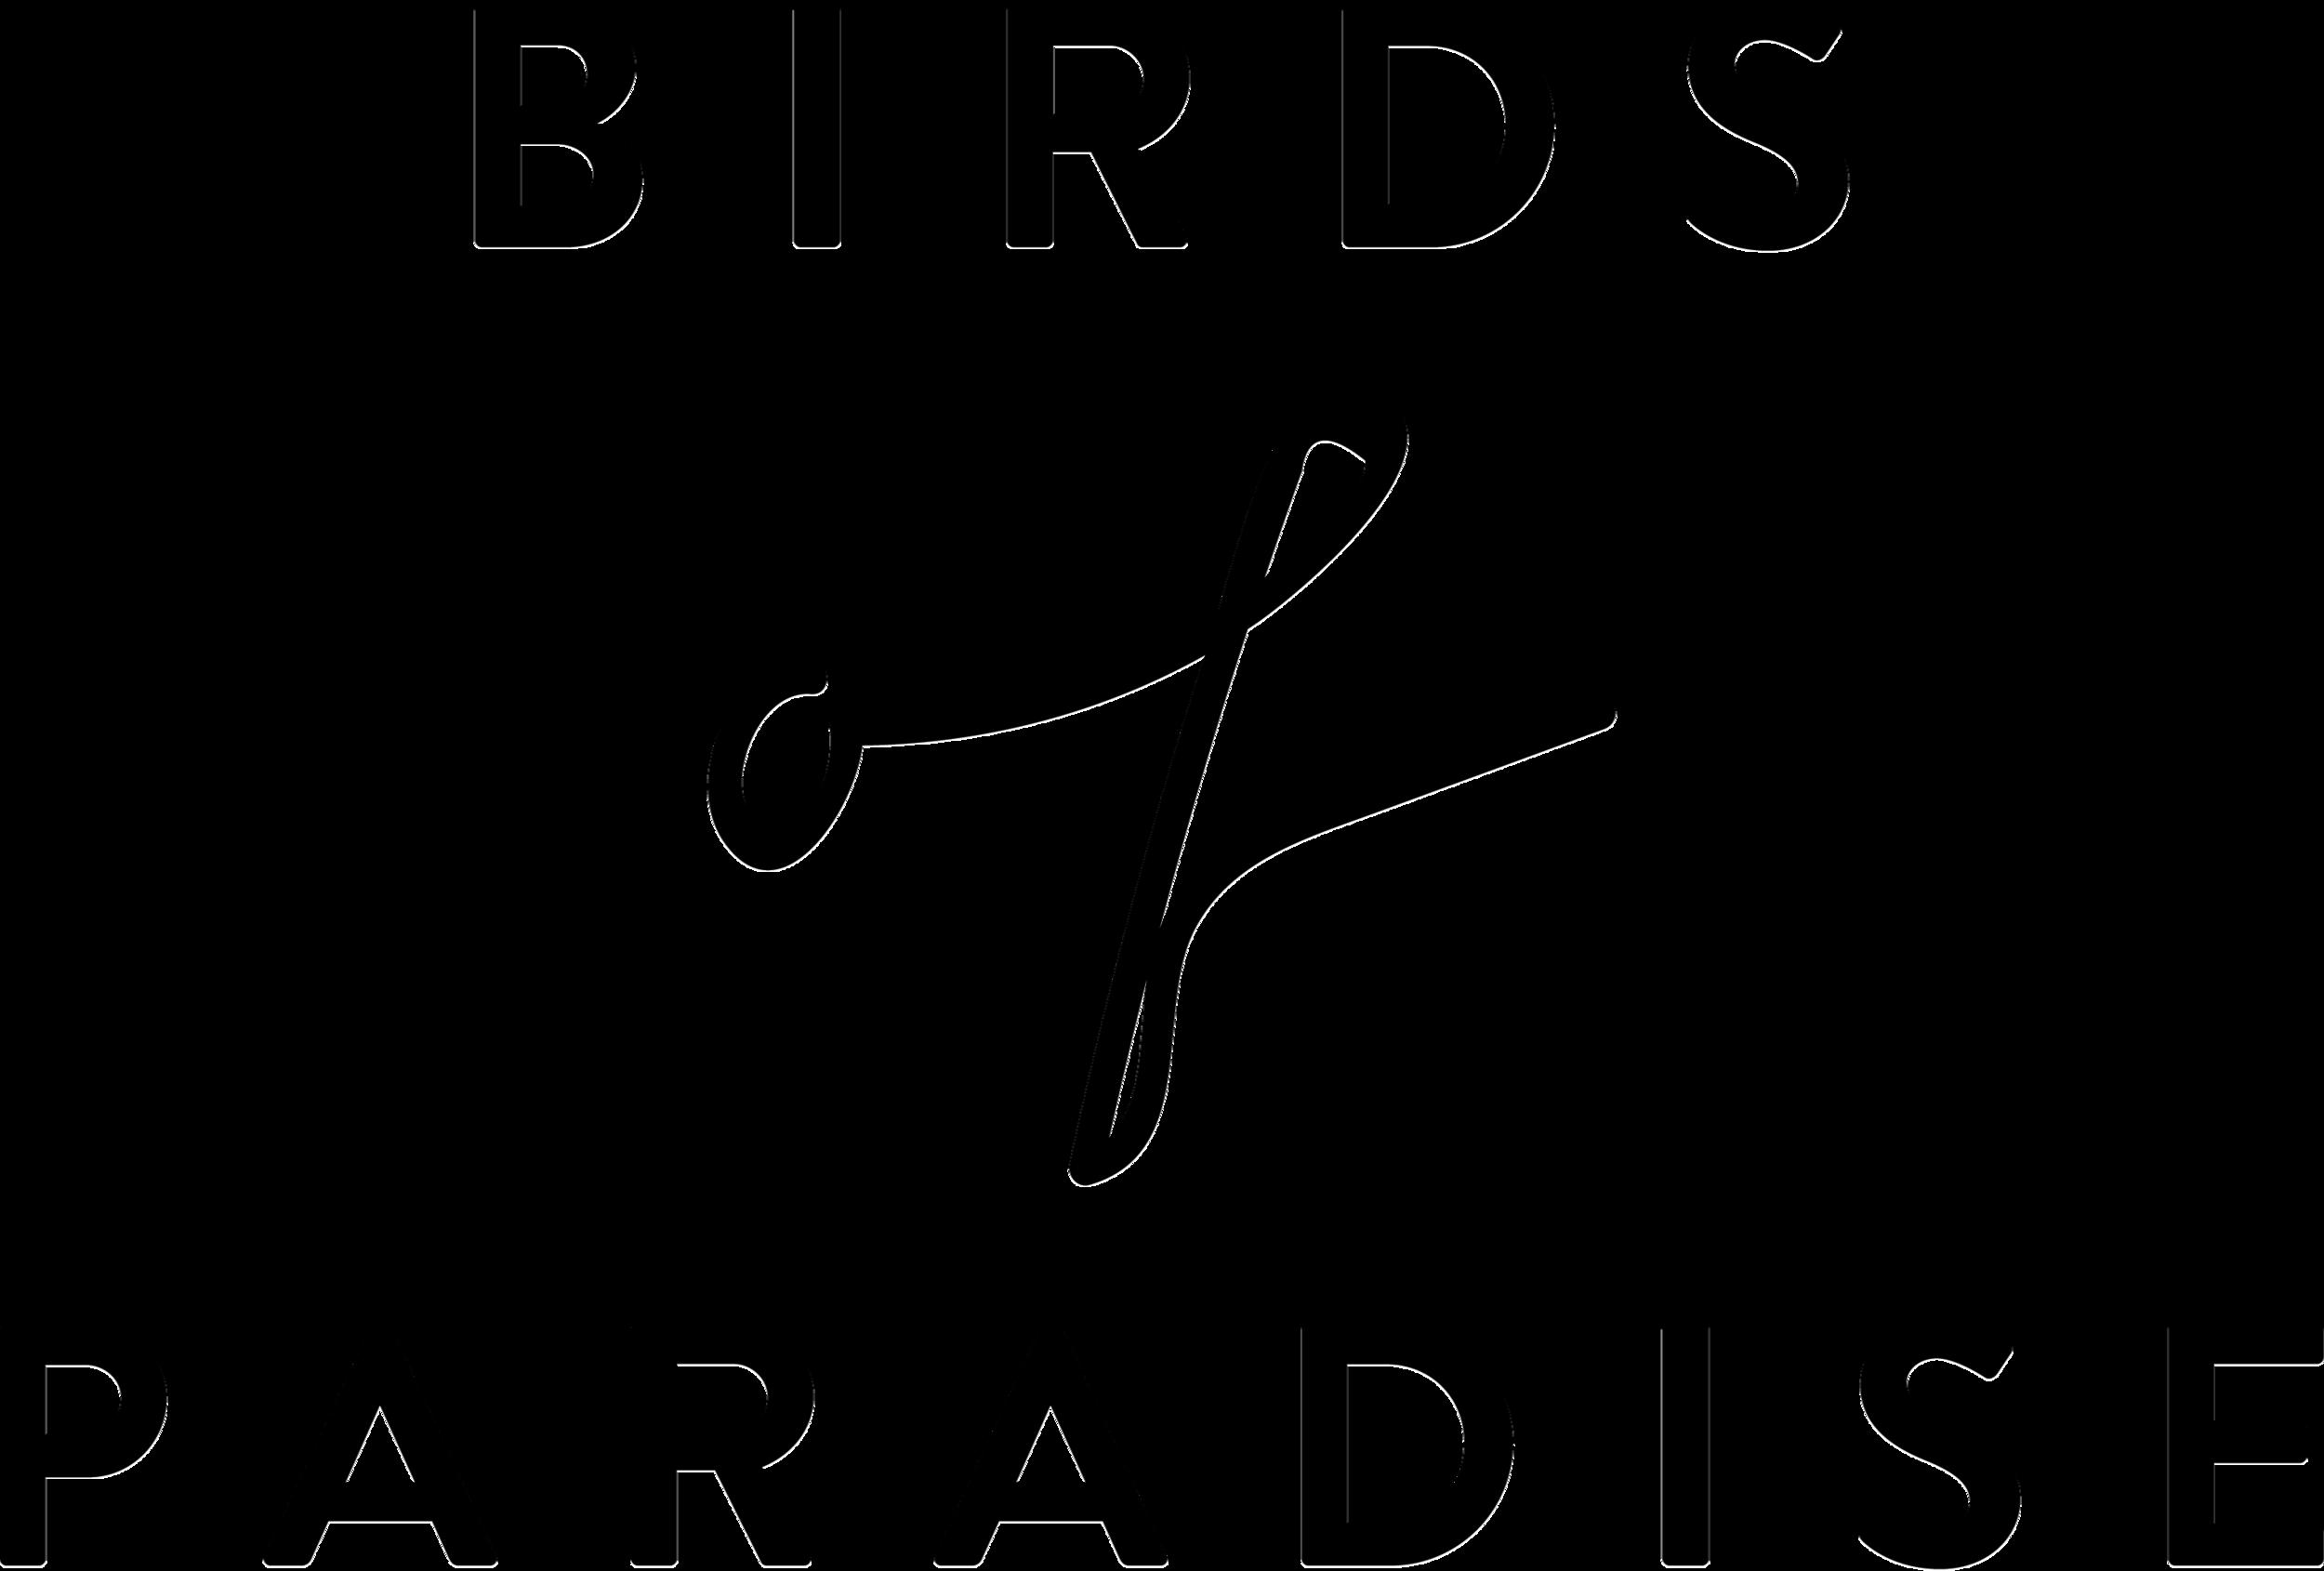 BirdsofParadise_logo_vertical_black.png